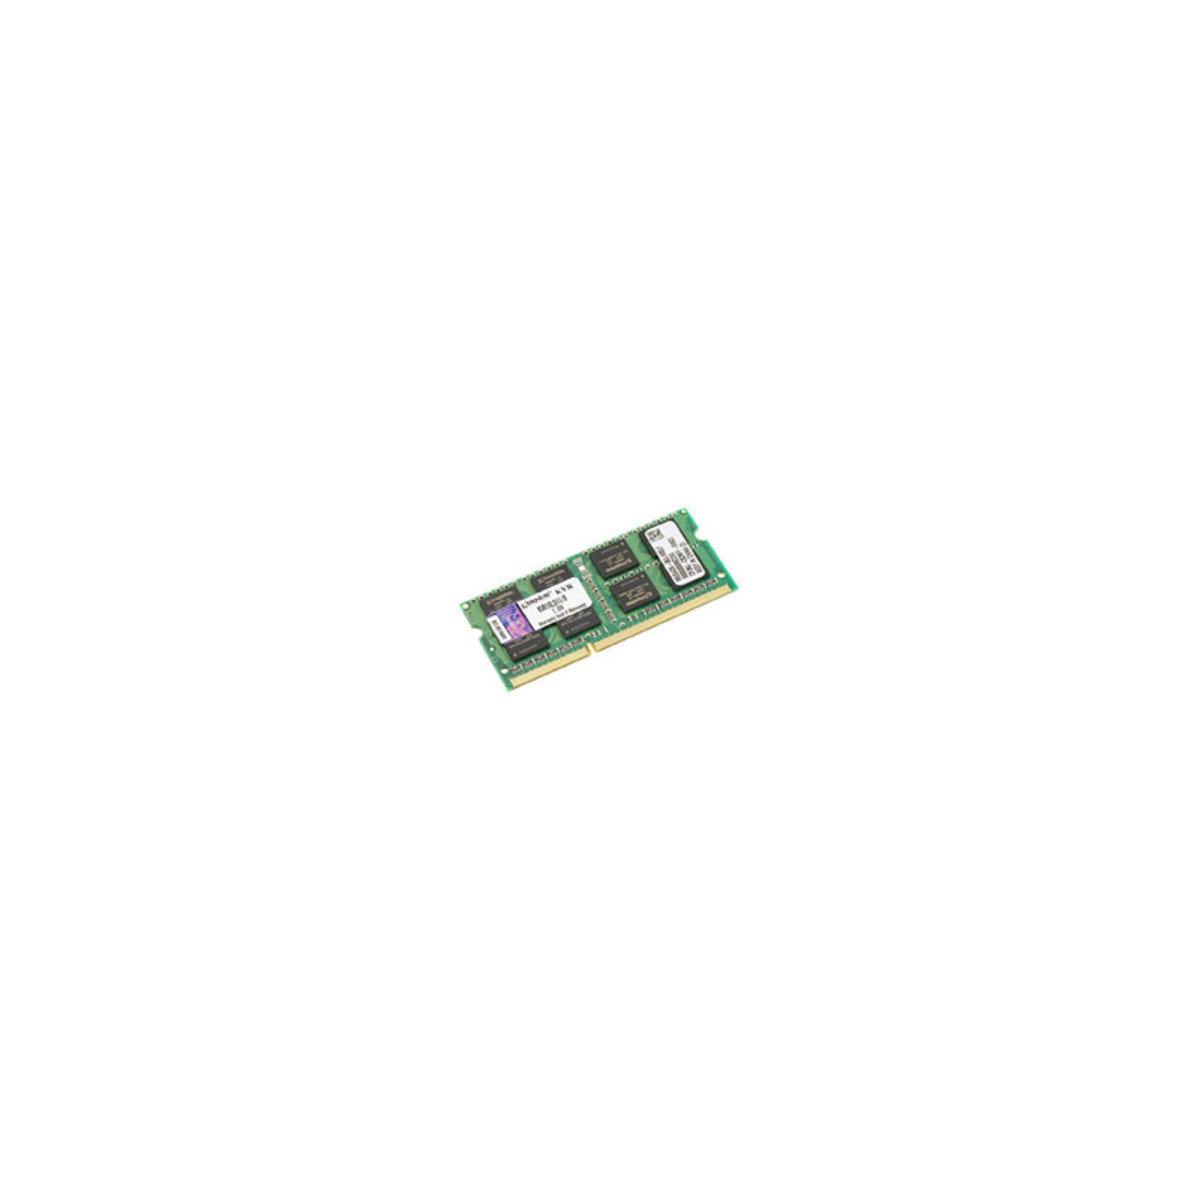 8GB DDR3L 筆記本電腦記憶體 KVR16LS11/8